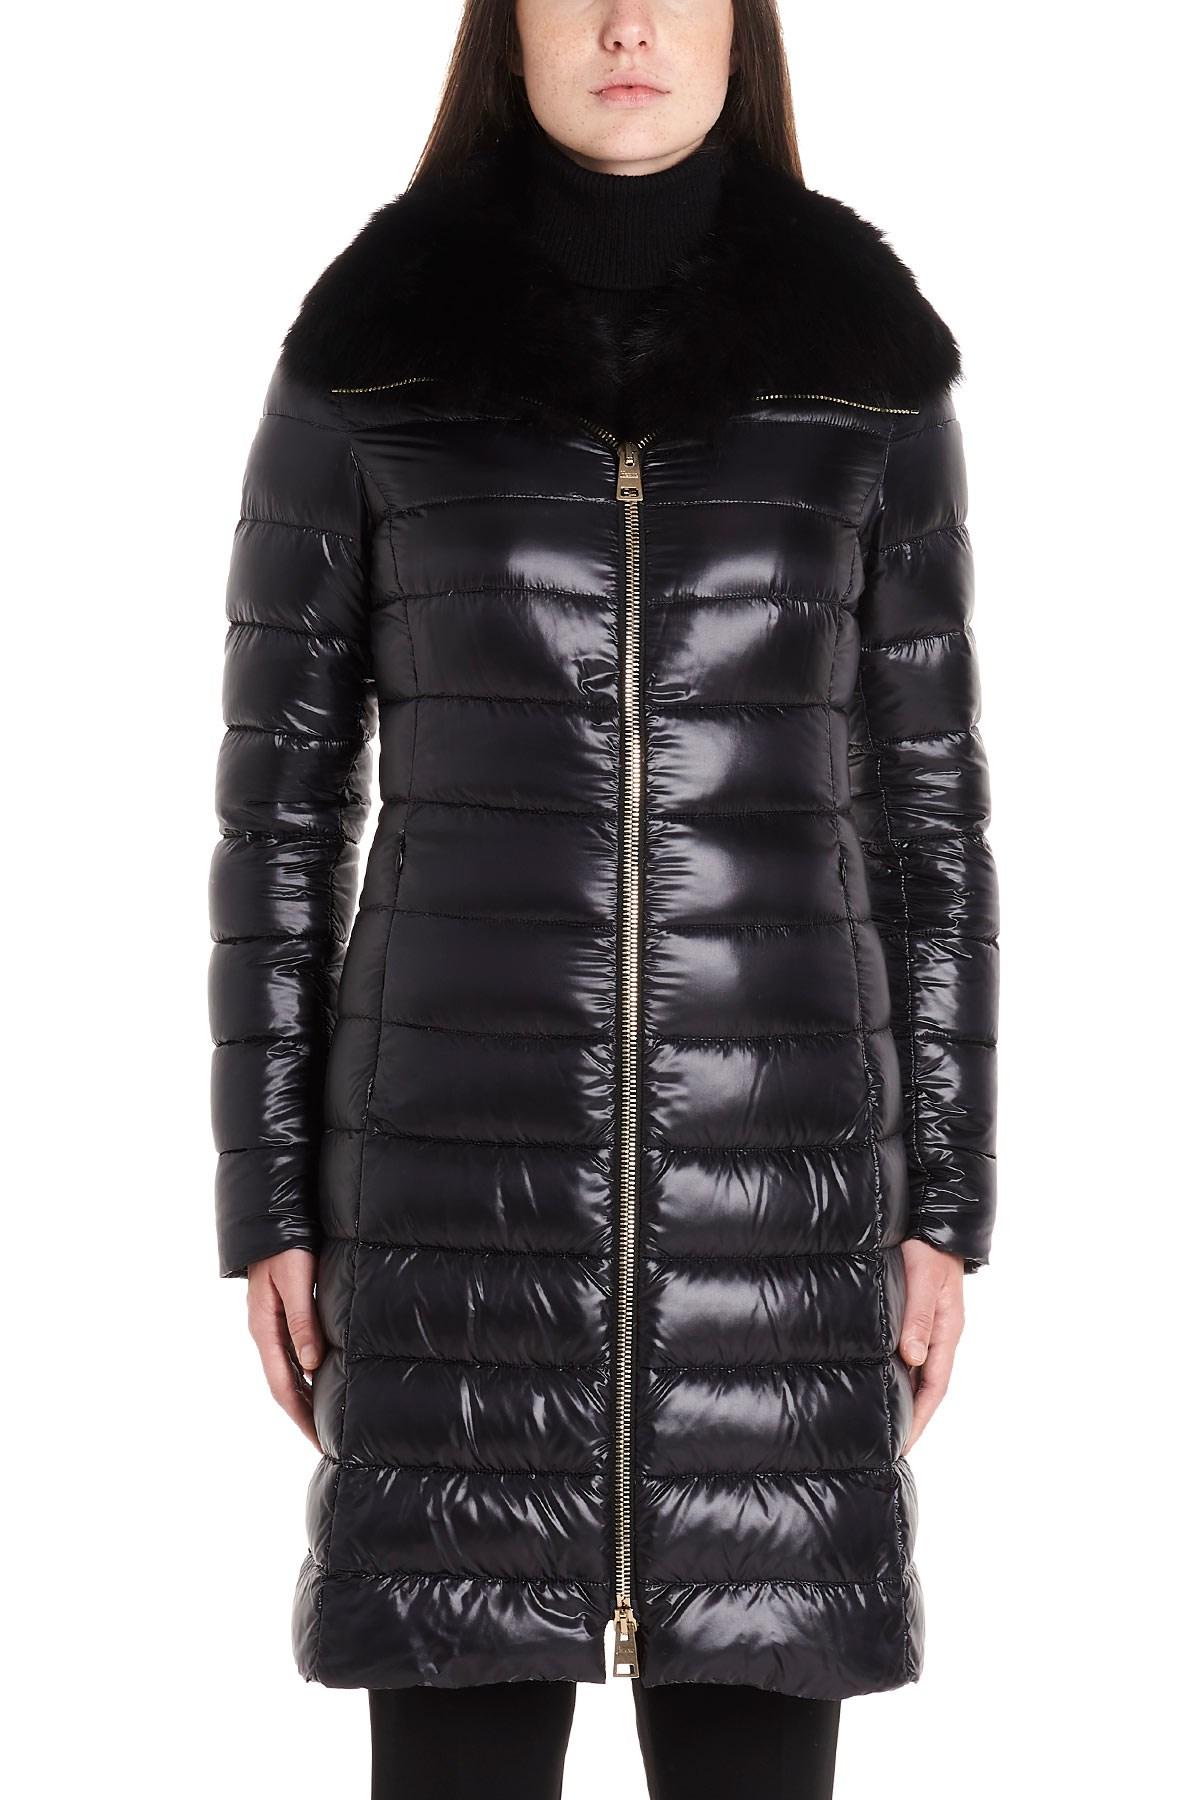 65b740977 herno 'Elisa' down jacket available on julian-fashion.com - 90541